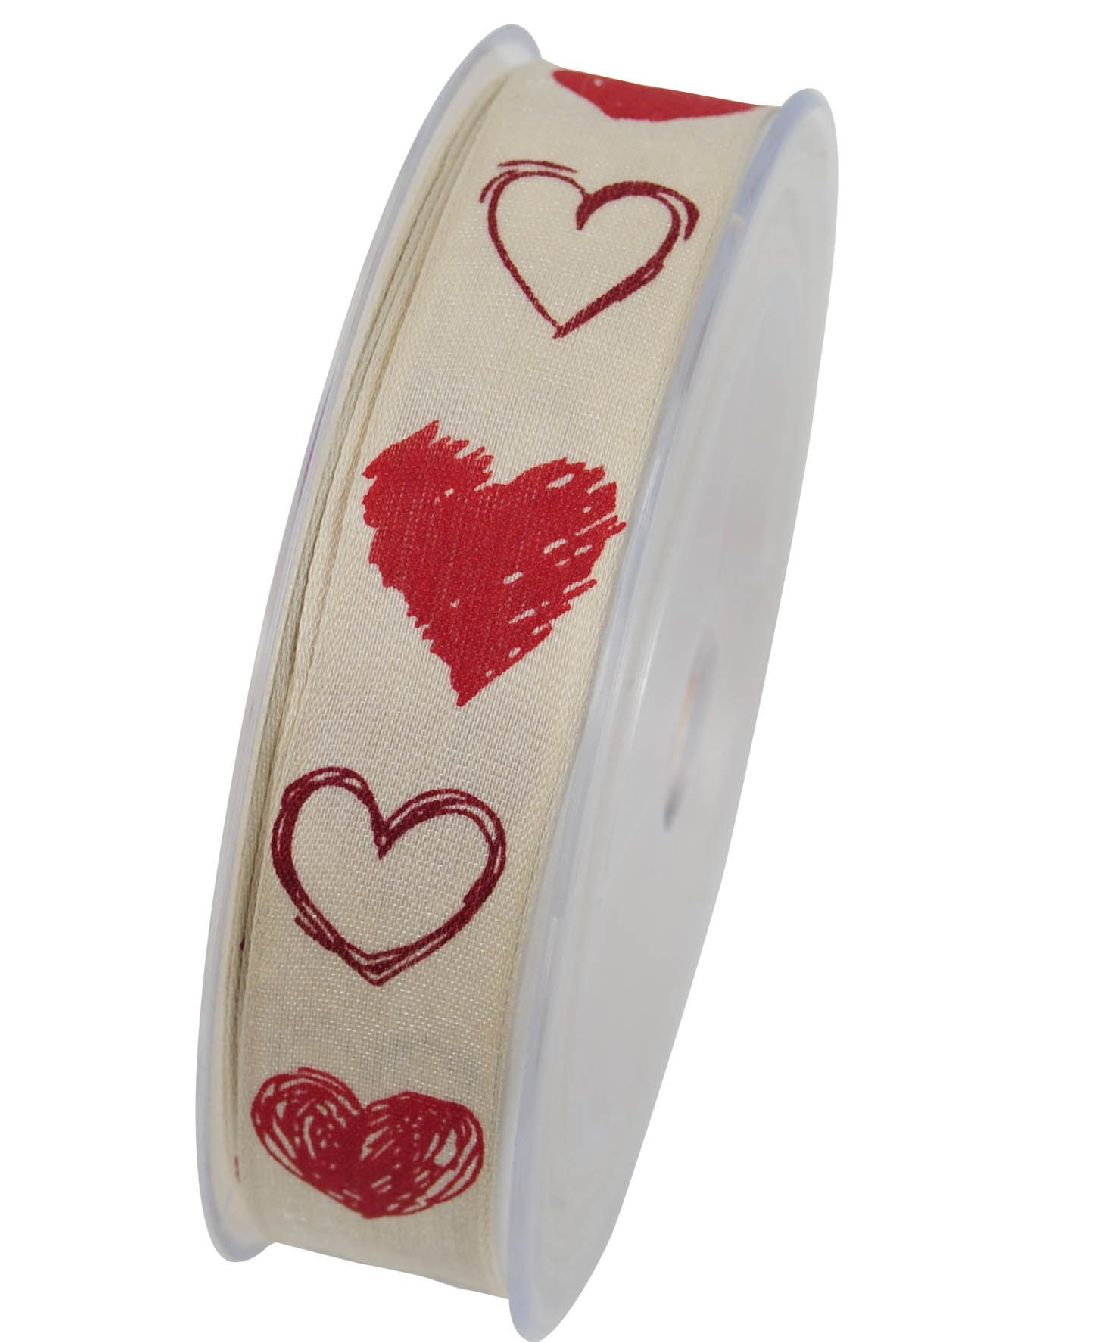 Herzband Heiratsantrag ROT X752 20 B:25mm L:20Meter mit Draht